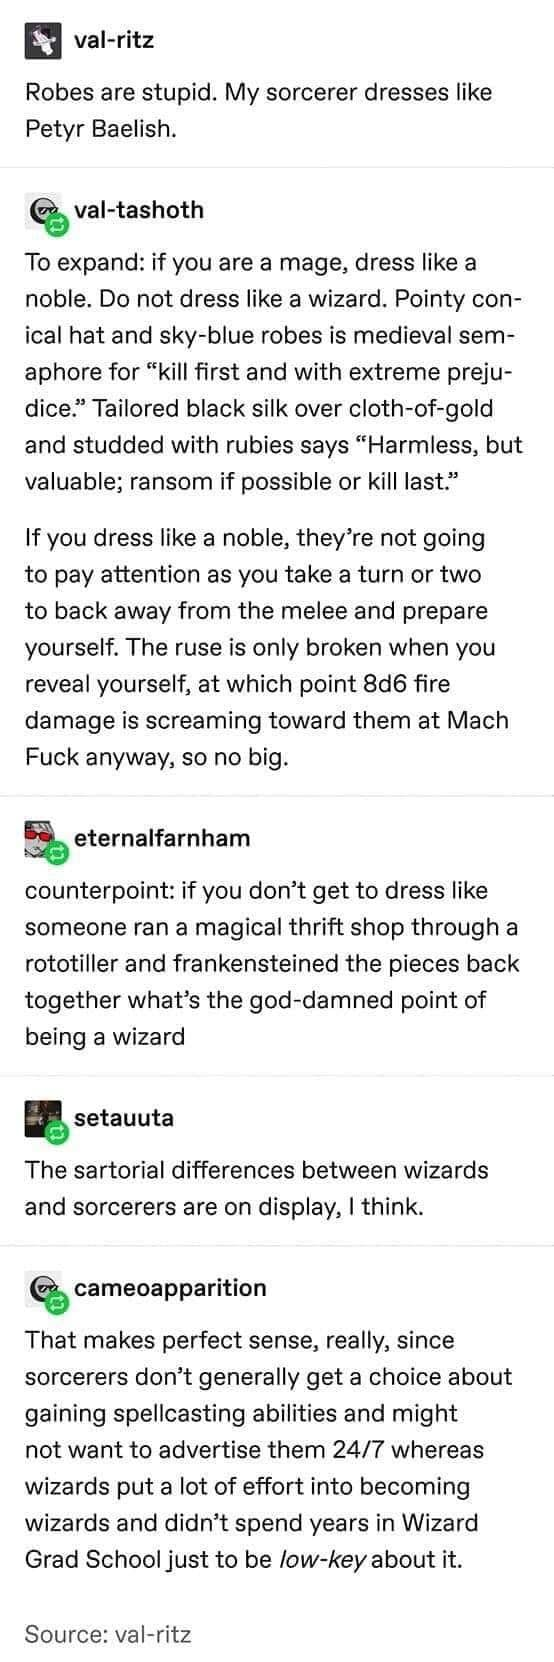 How a Mage Should Dress